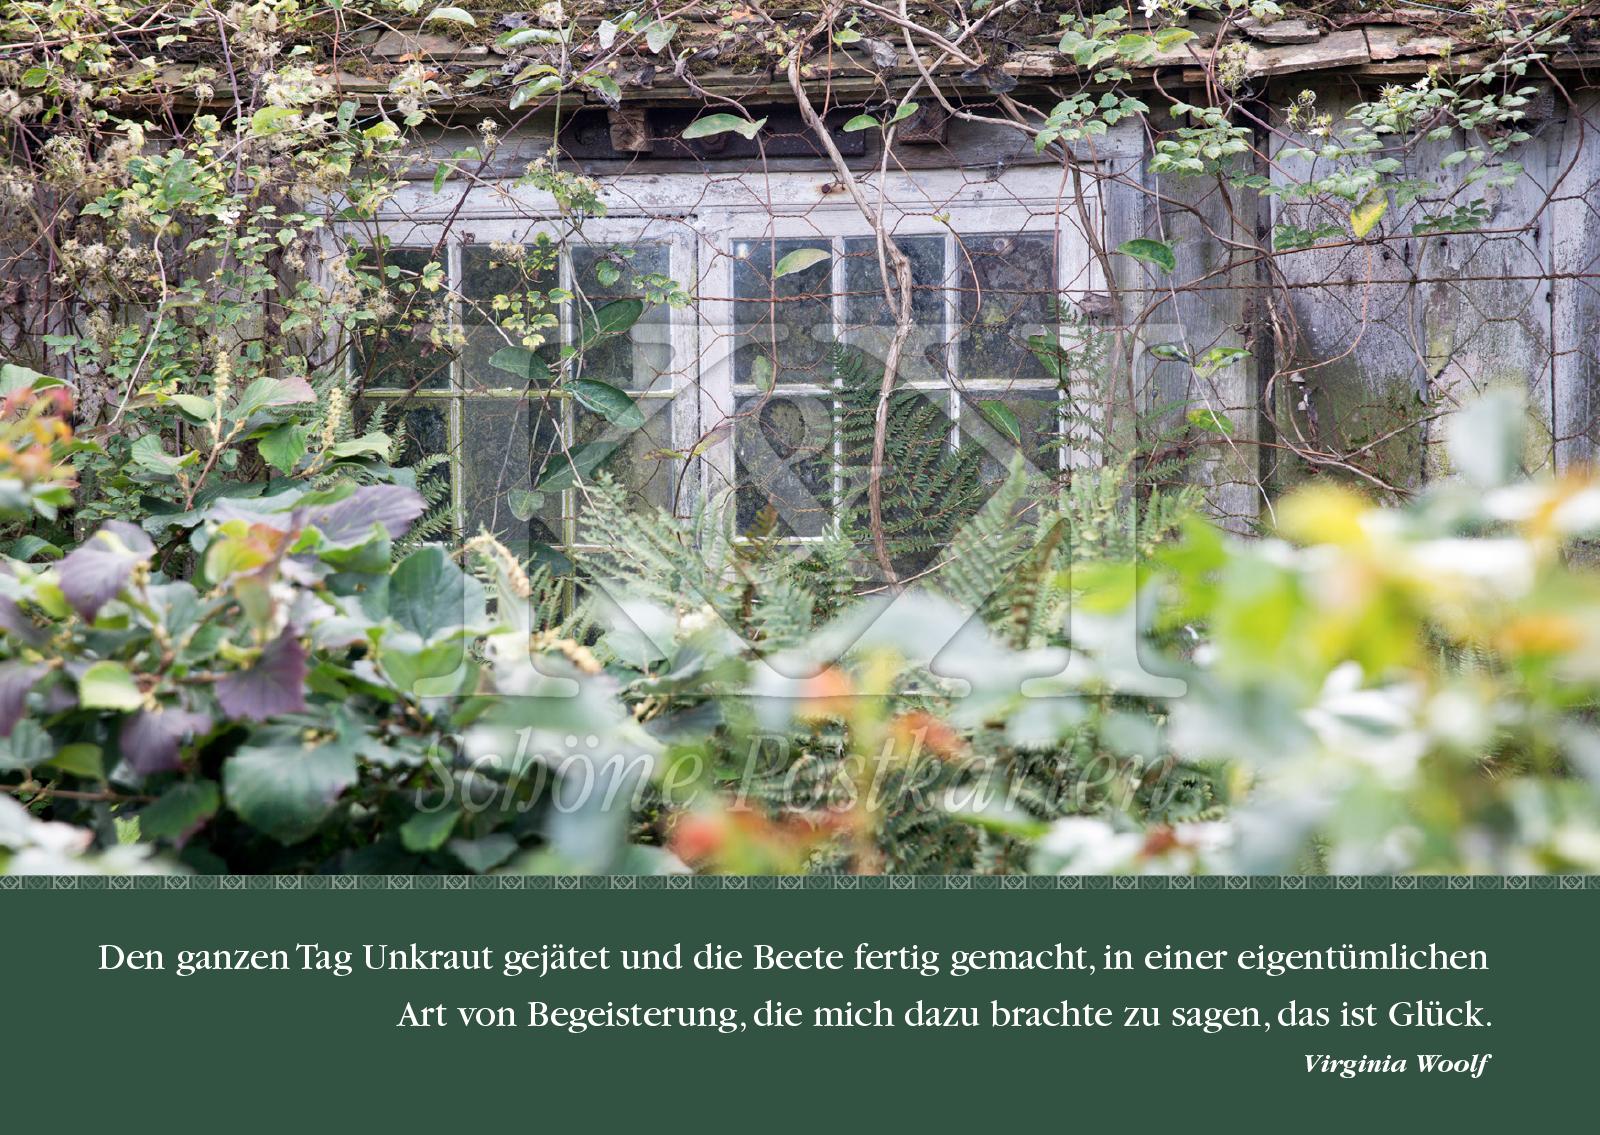 Die Kraas & Lachmann-Postkarte Nr. 2. © 2016 Kraas & Lachmann.